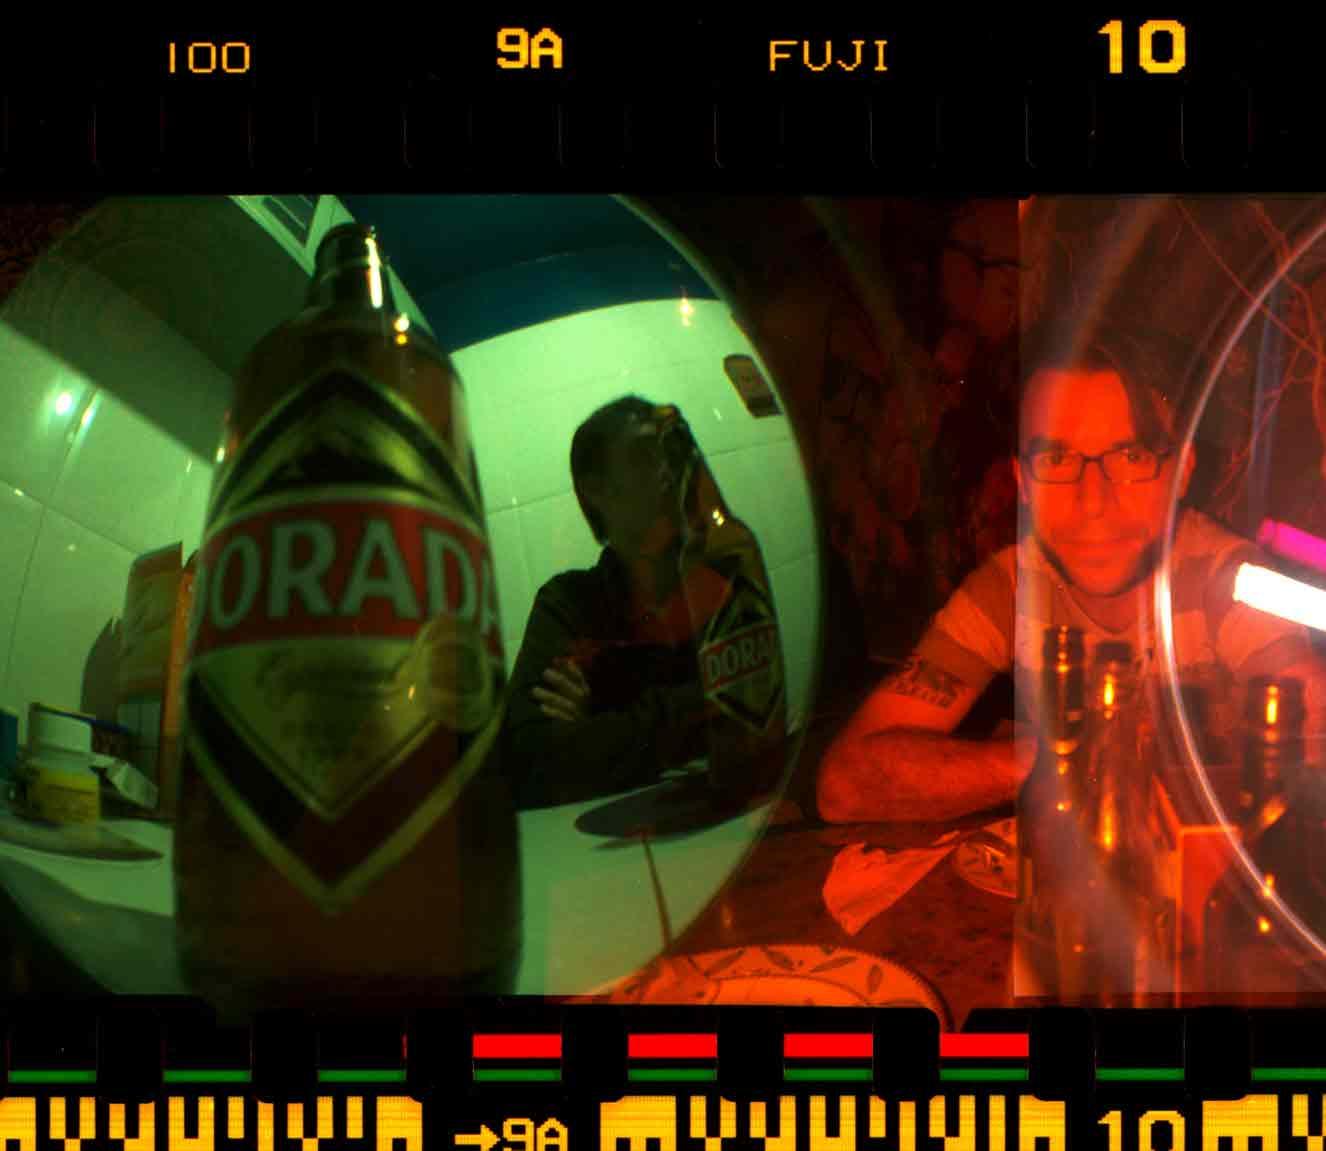 FilmSwap-fotografia-oldskull-02